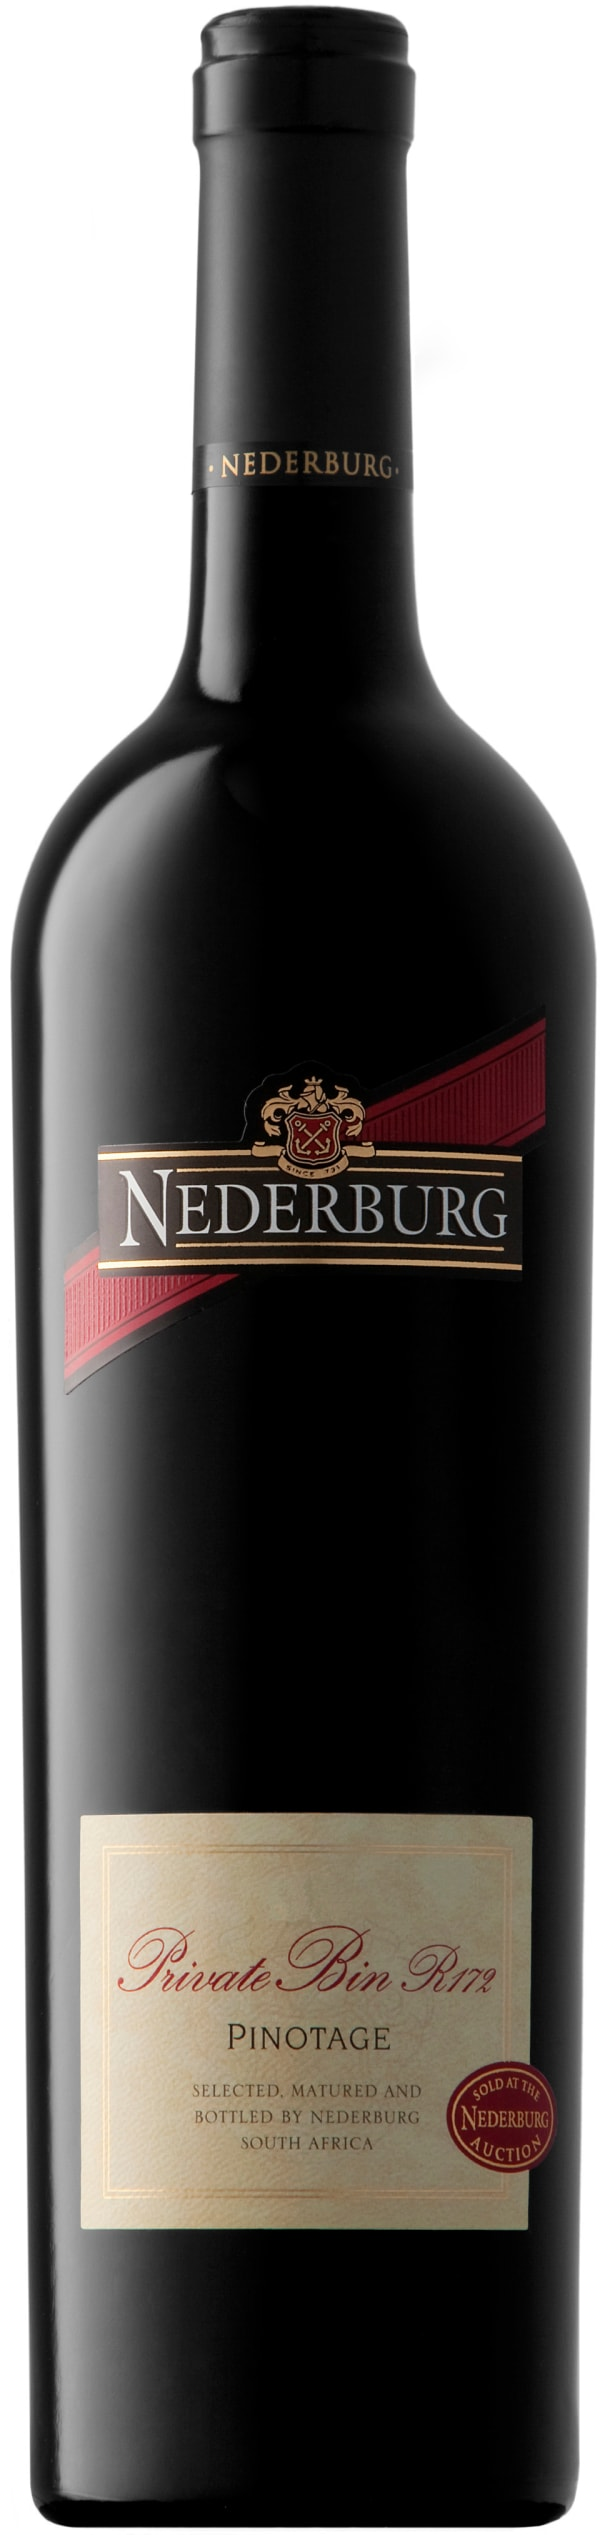 Nederburg Private Bin R172 Pinotage 2010